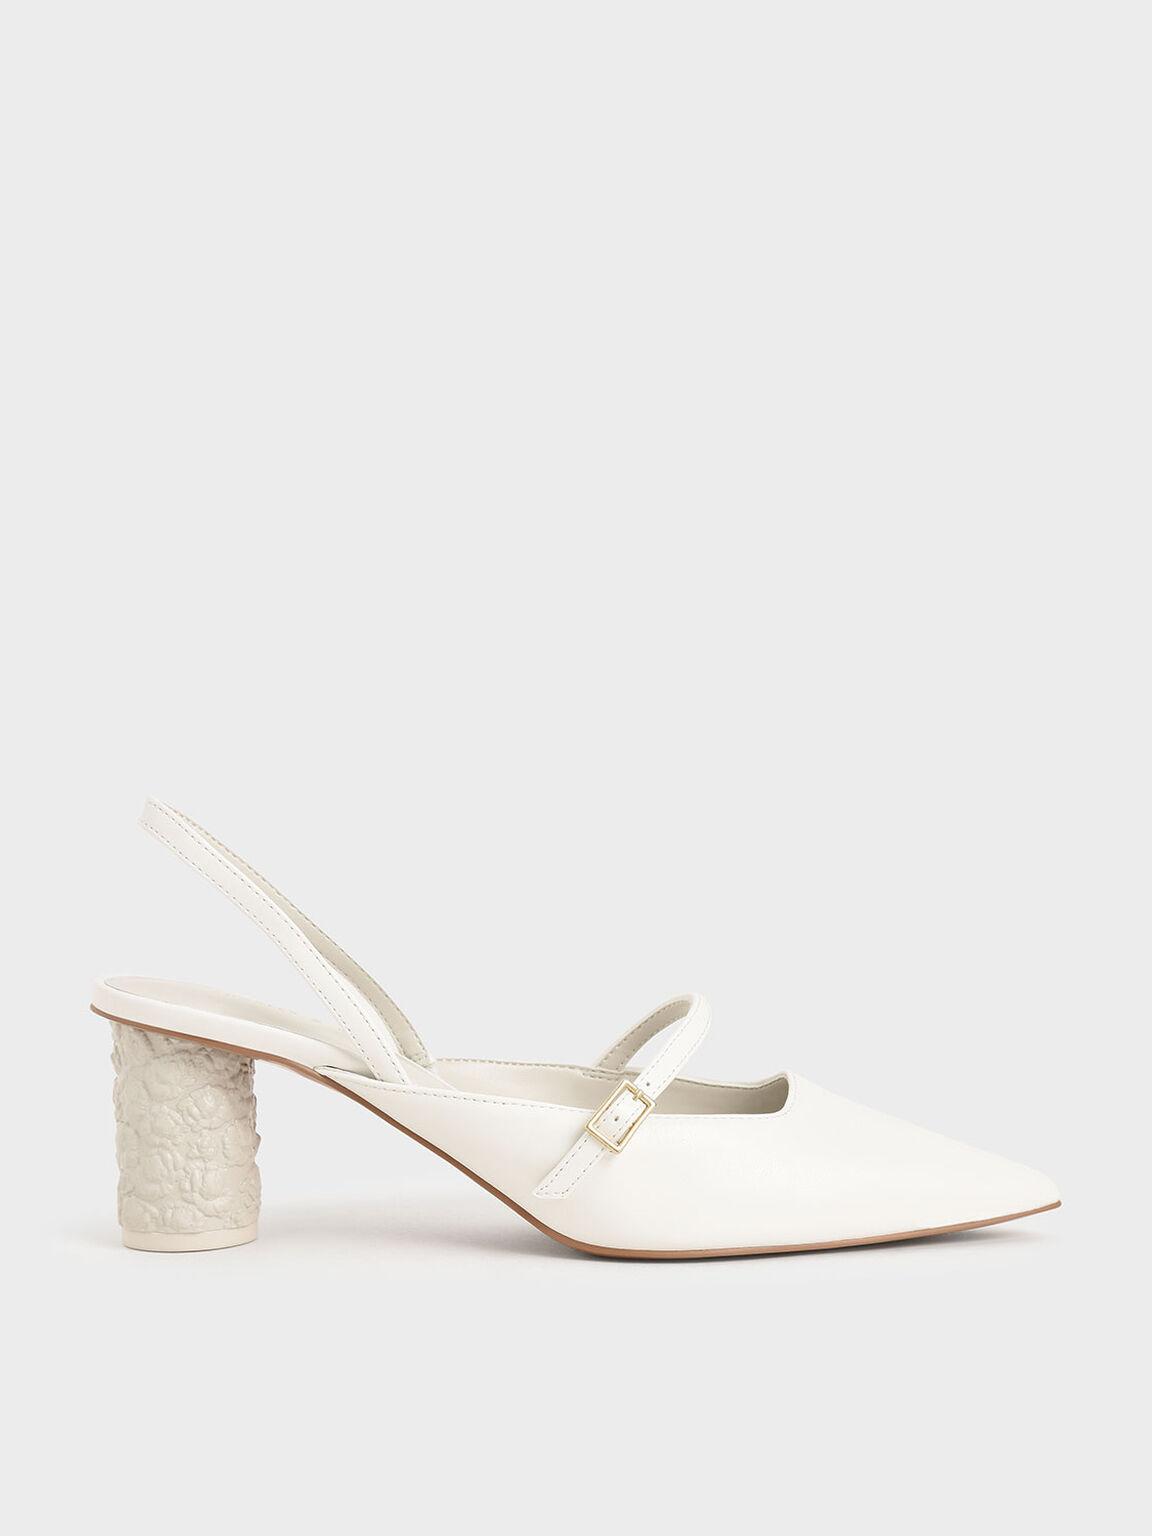 Embossed Heel Slingback Pumps, White, hi-res